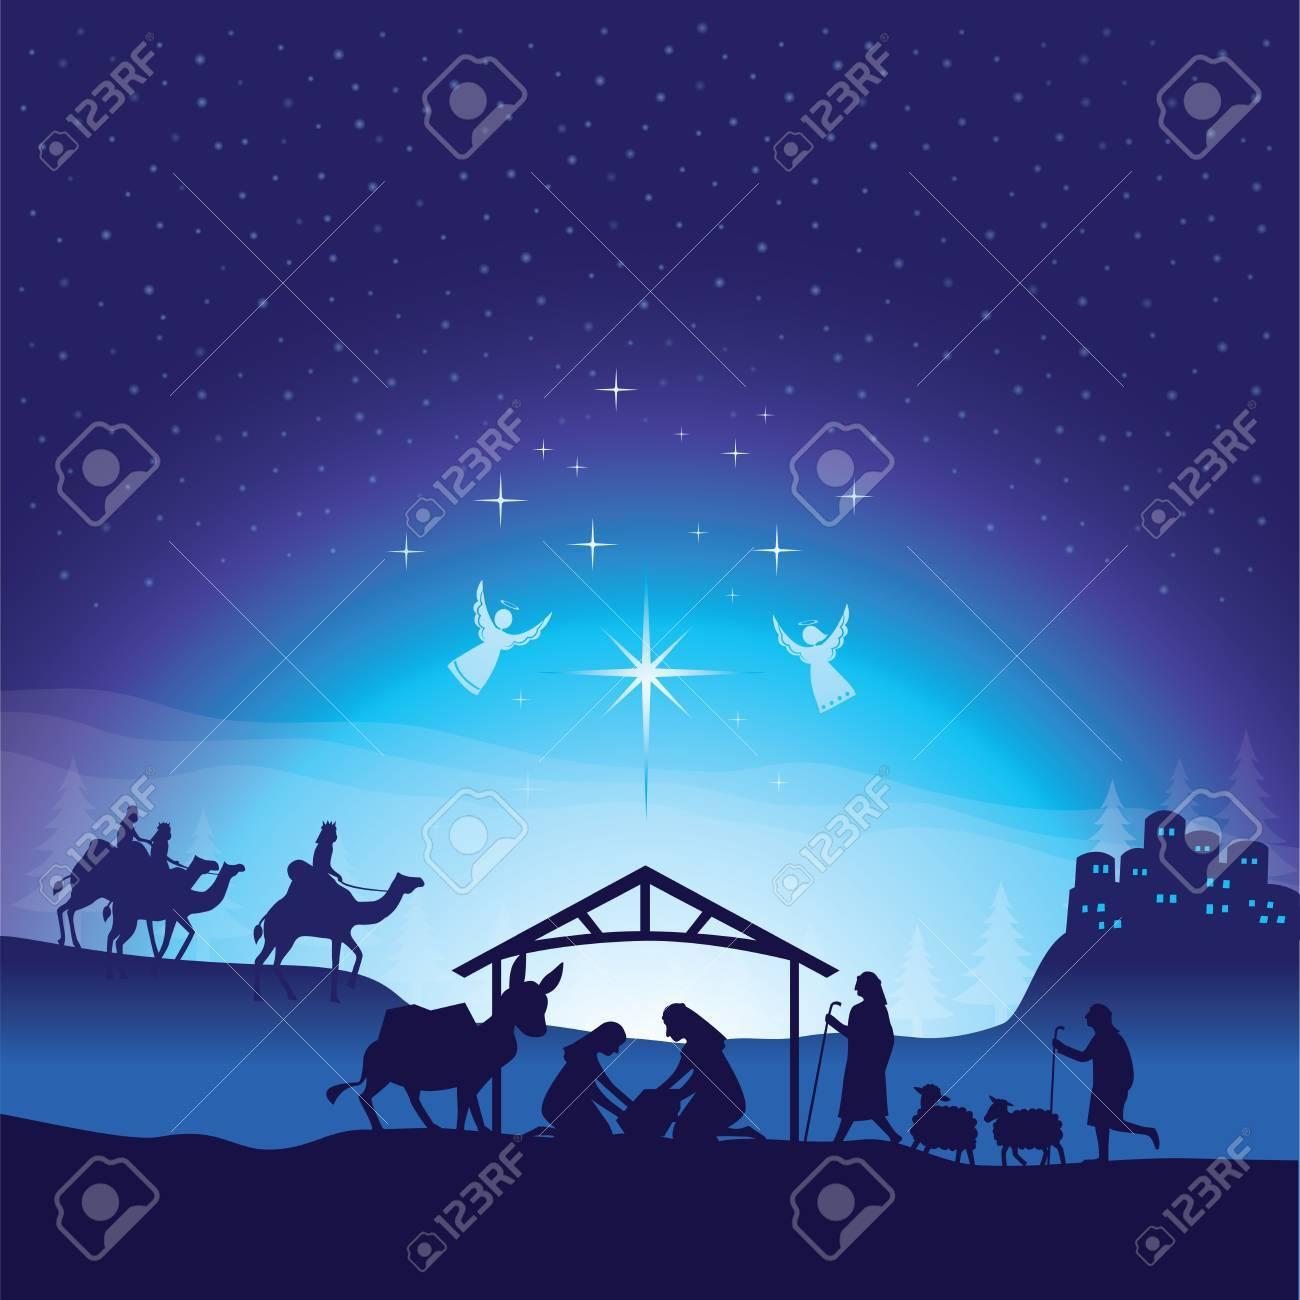 Christmas nativity scene. - 88177418